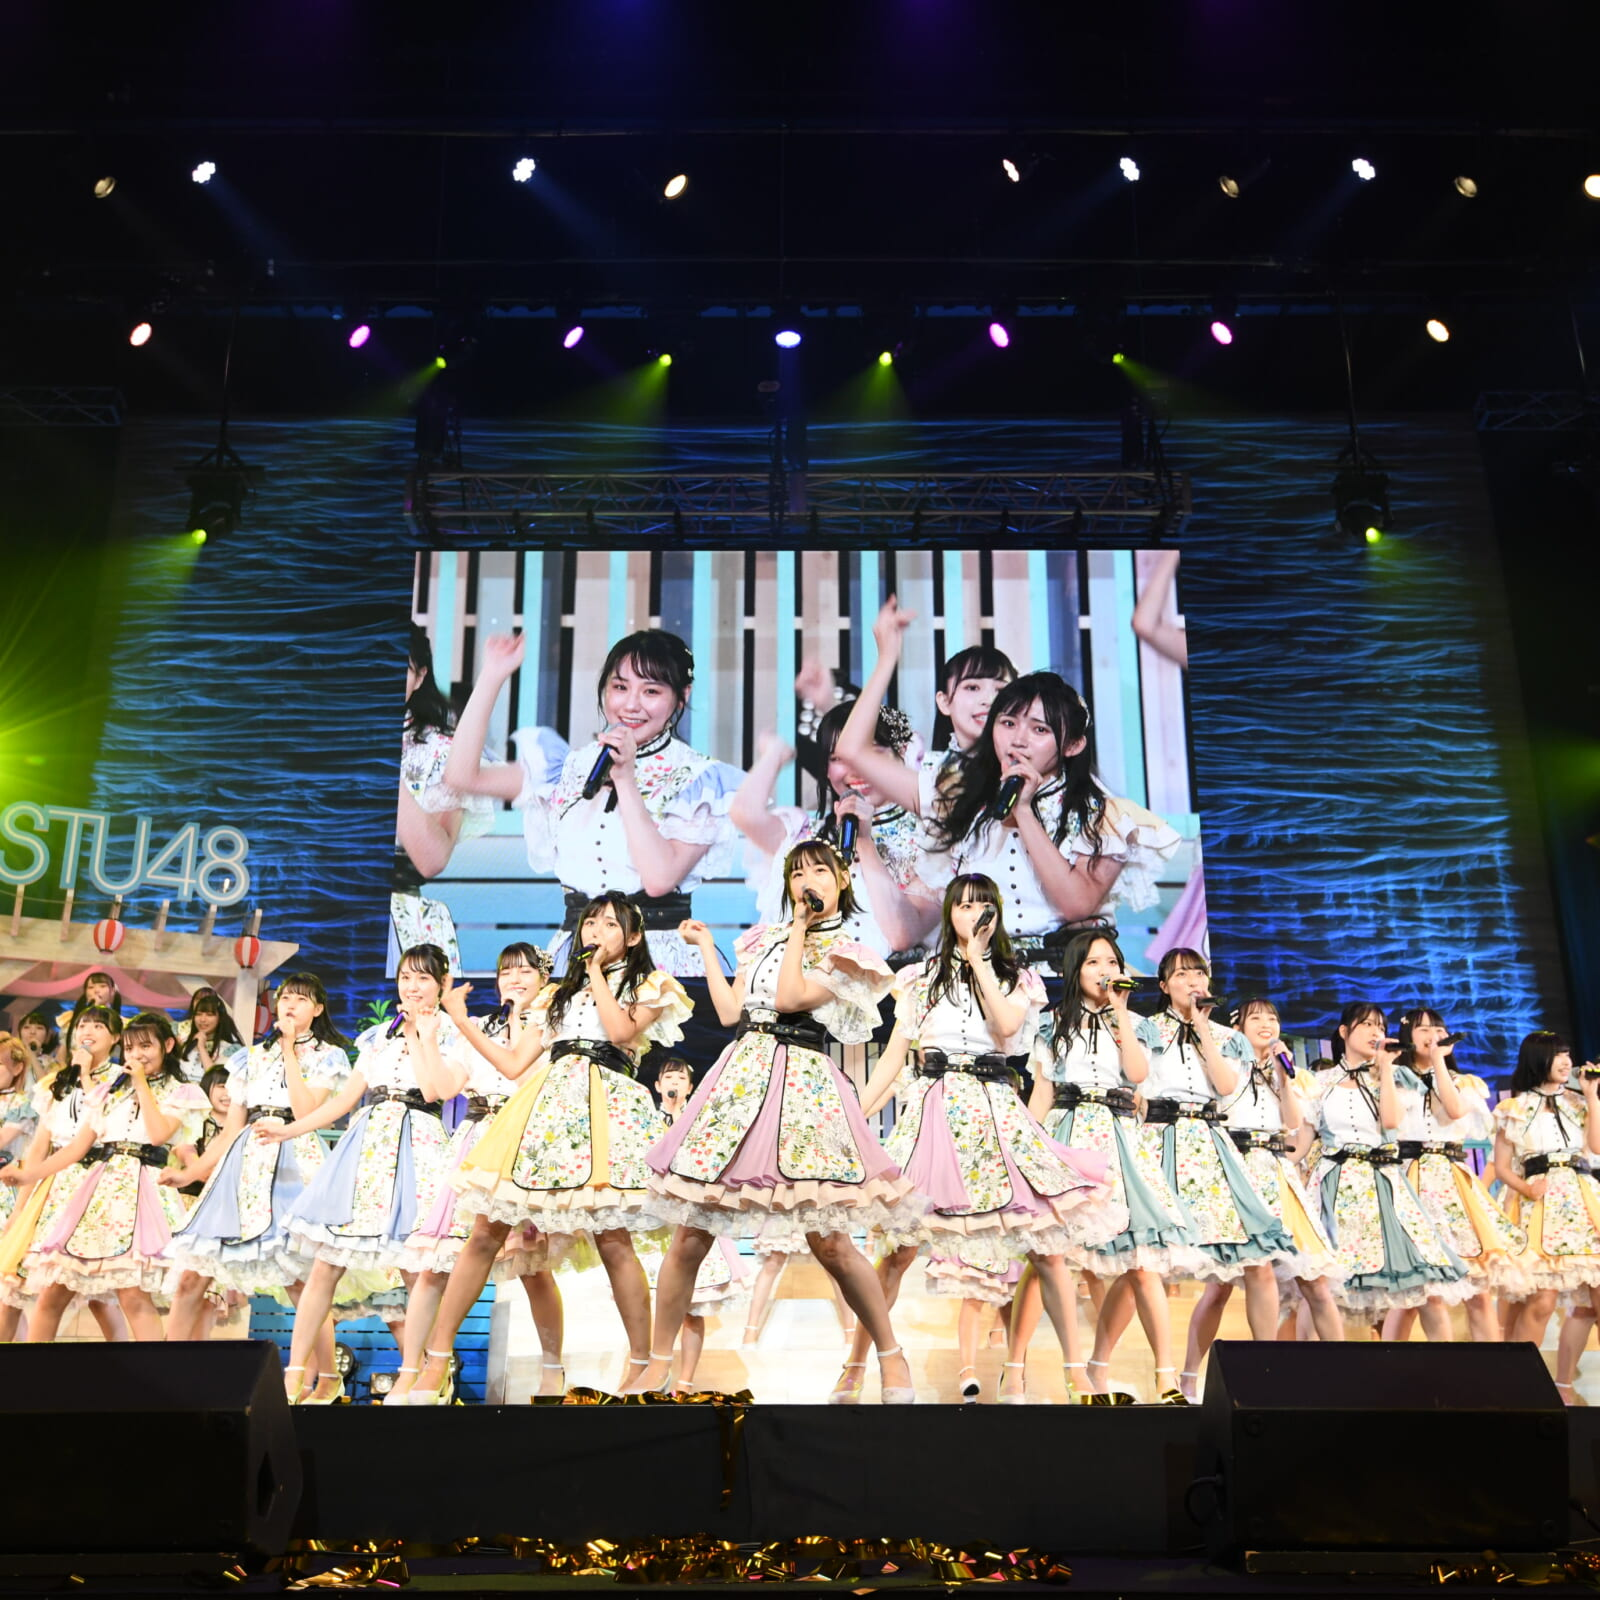 STU48 7 thシングル「ヘタレたちよ」センターは 瀧野由美子。そして、前キャプテン・岡田奈々はSTU48最後の楽曲参加に。さらに2期研究生は正規メンバーへ昇格! ヘタレたちはまた新たな航路へと突き進む …!